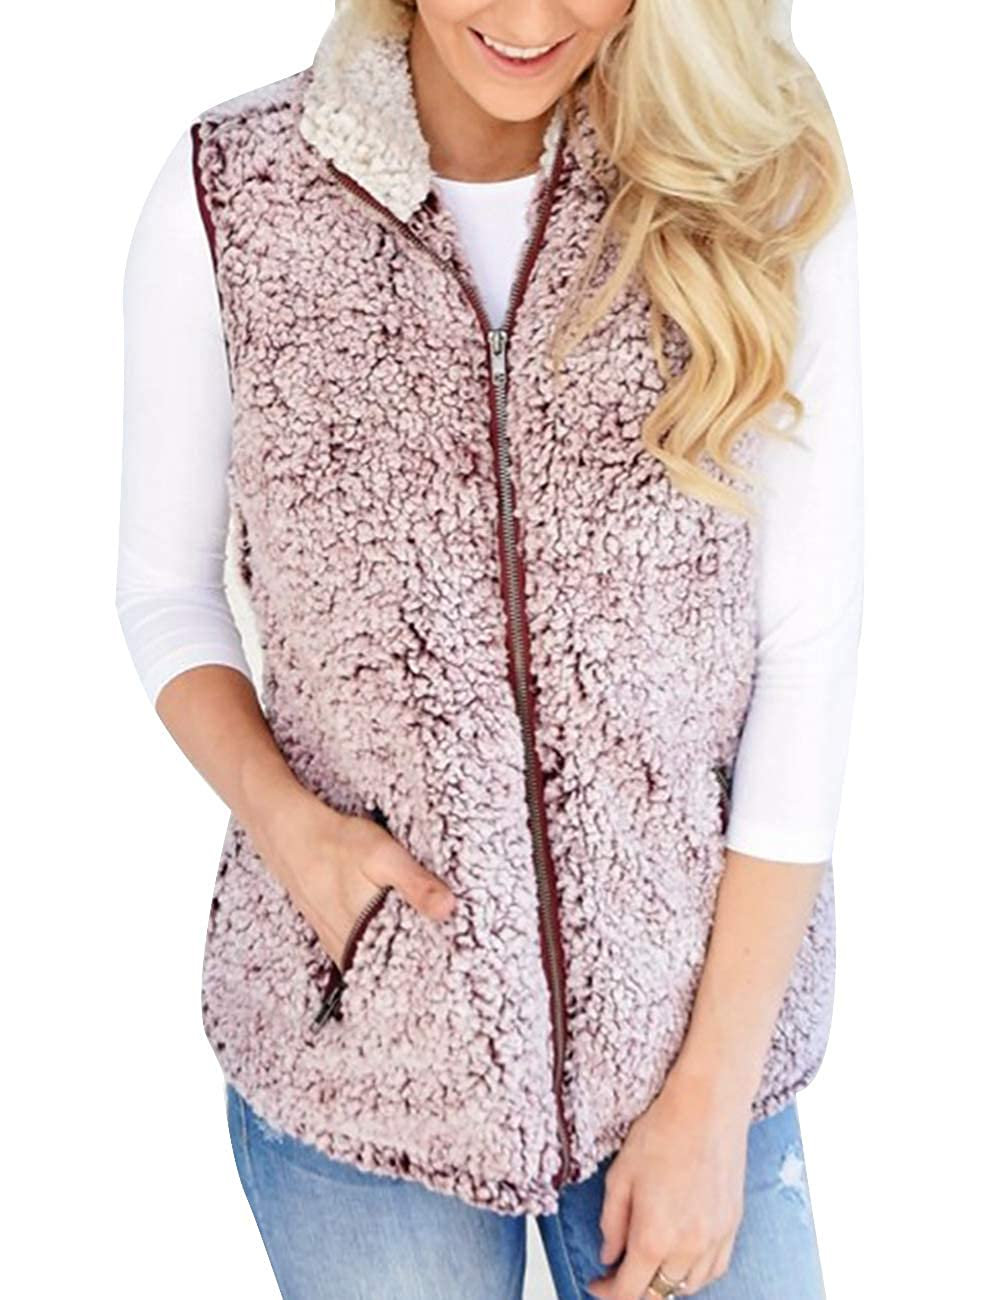 SOMTHRON Women Fuzzy Outdoor Sweater Coat Sleeveless Sherpa Fleece Pocket Vest Jacket